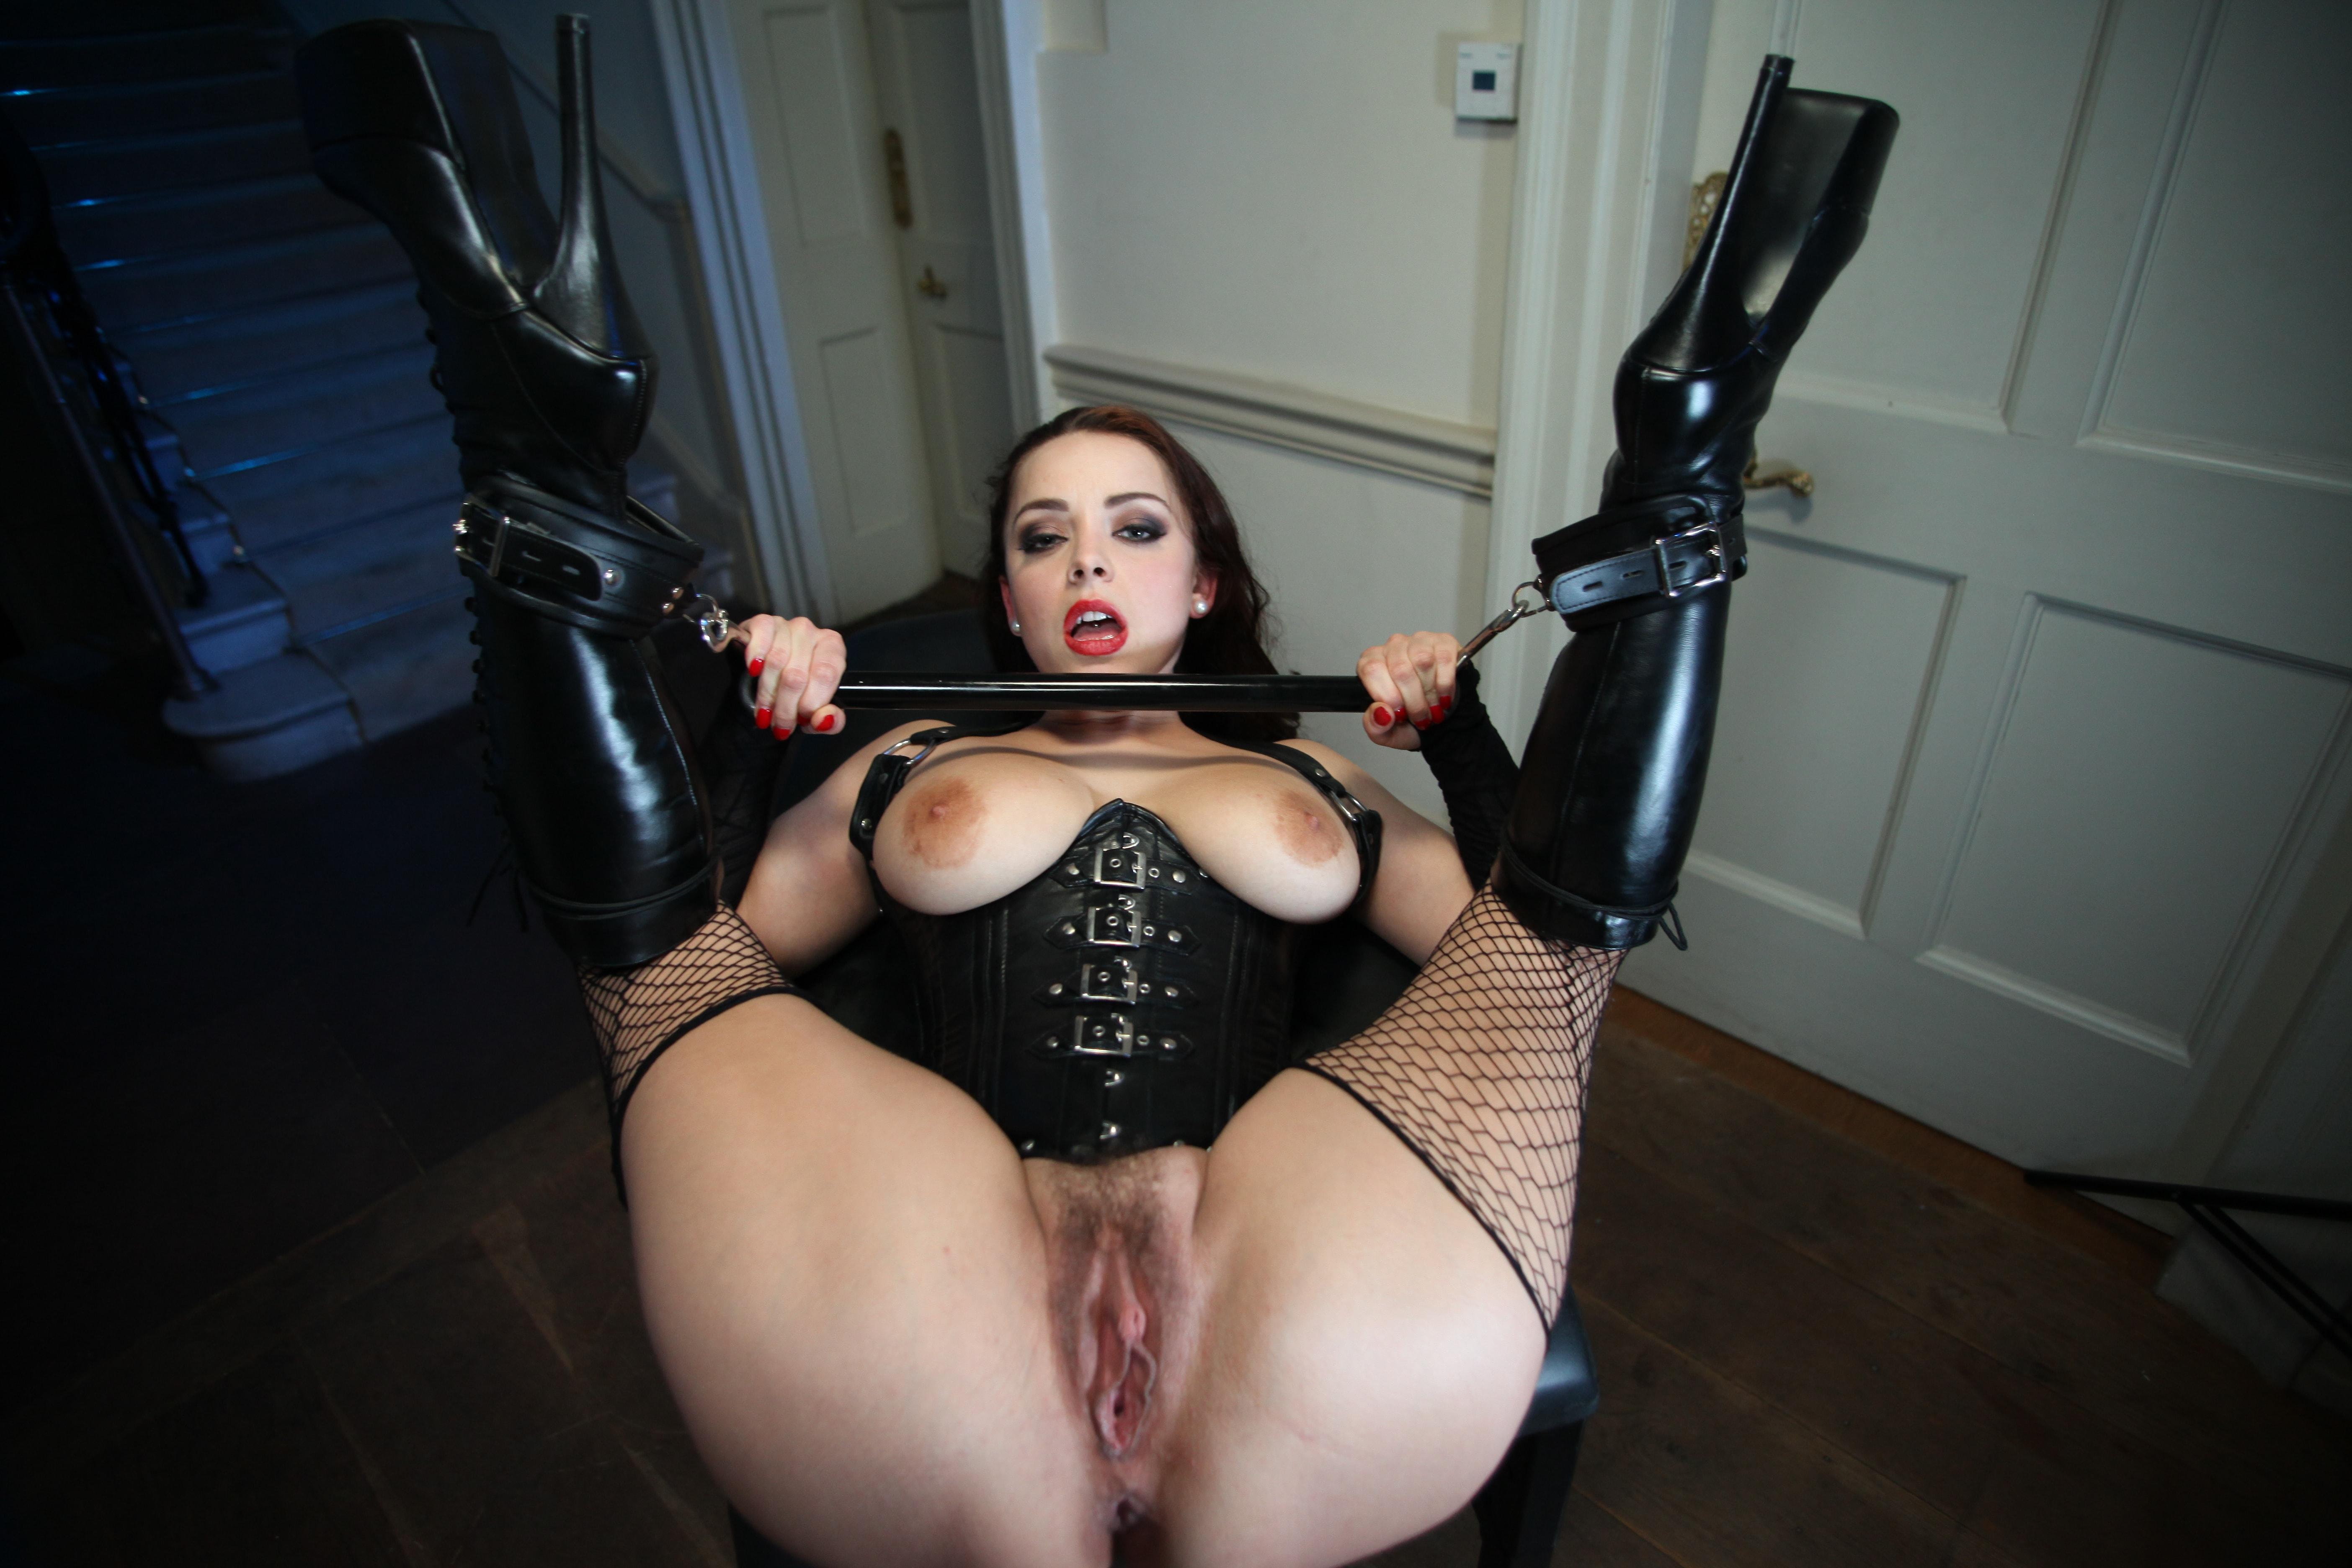 Xxx corset pics, free corslet porn galery, sexy corselet clips